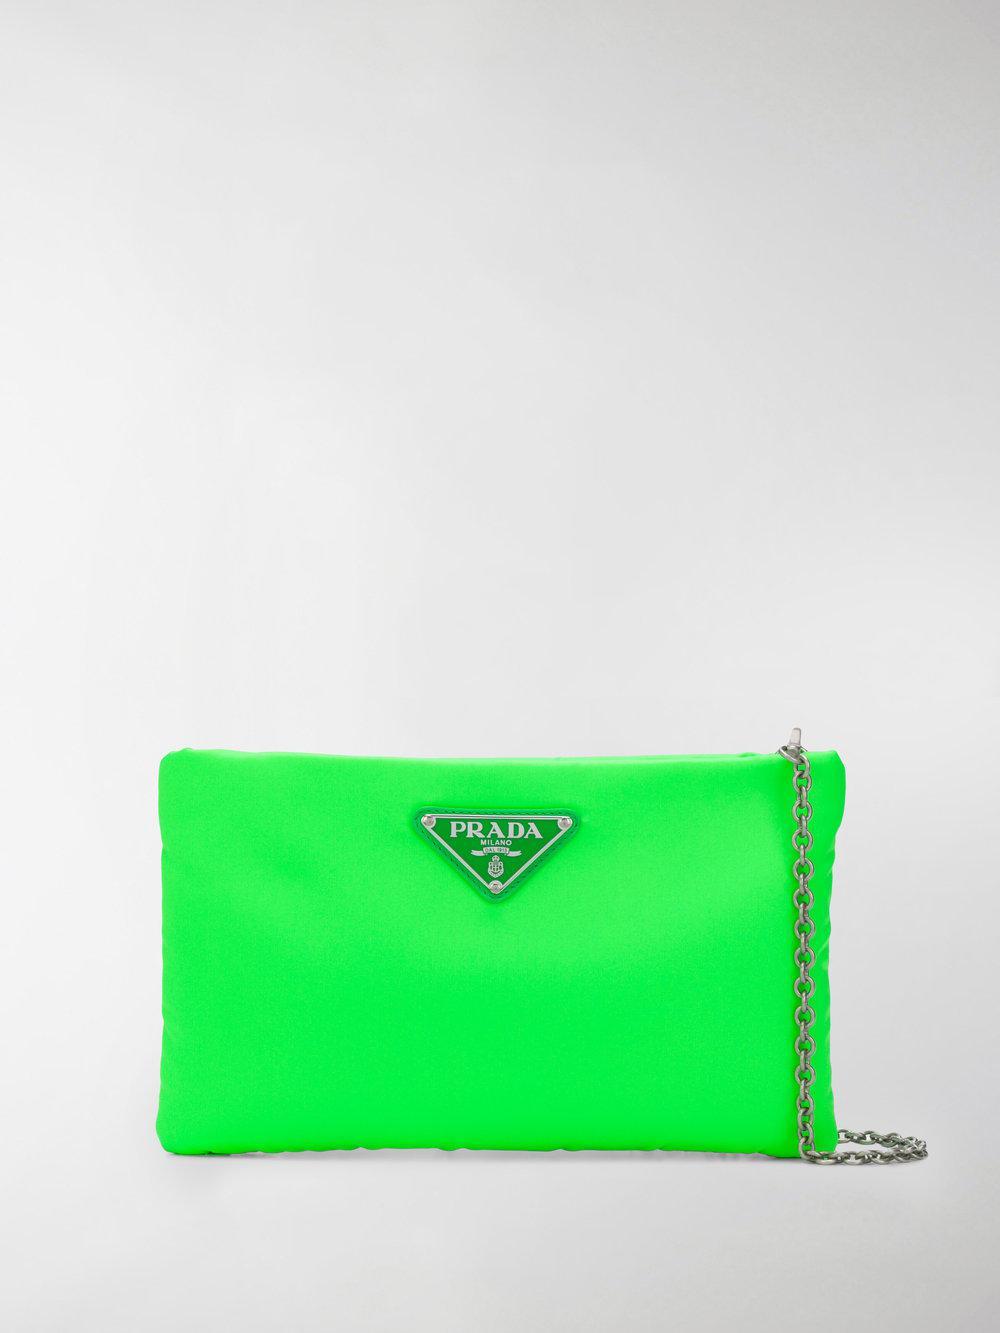 b0c43b24a4c7 Prada - Green Padded Nylon Clutch Bag - Lyst. View fullscreen